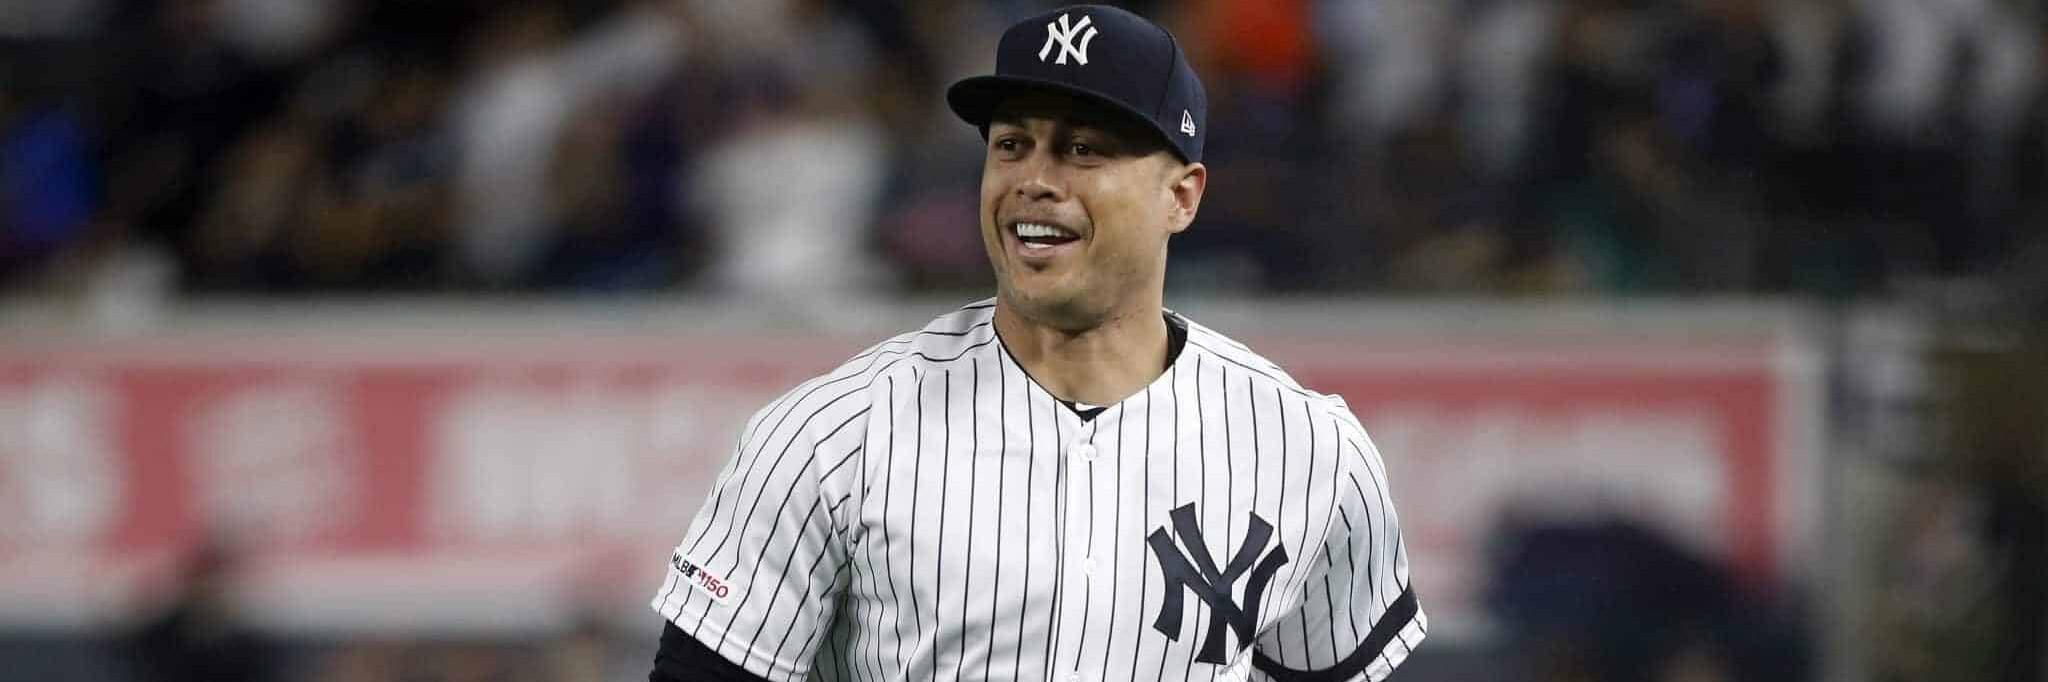 Giancarlo Stanton MLB Awards Odds & Analysis For 2020 Season